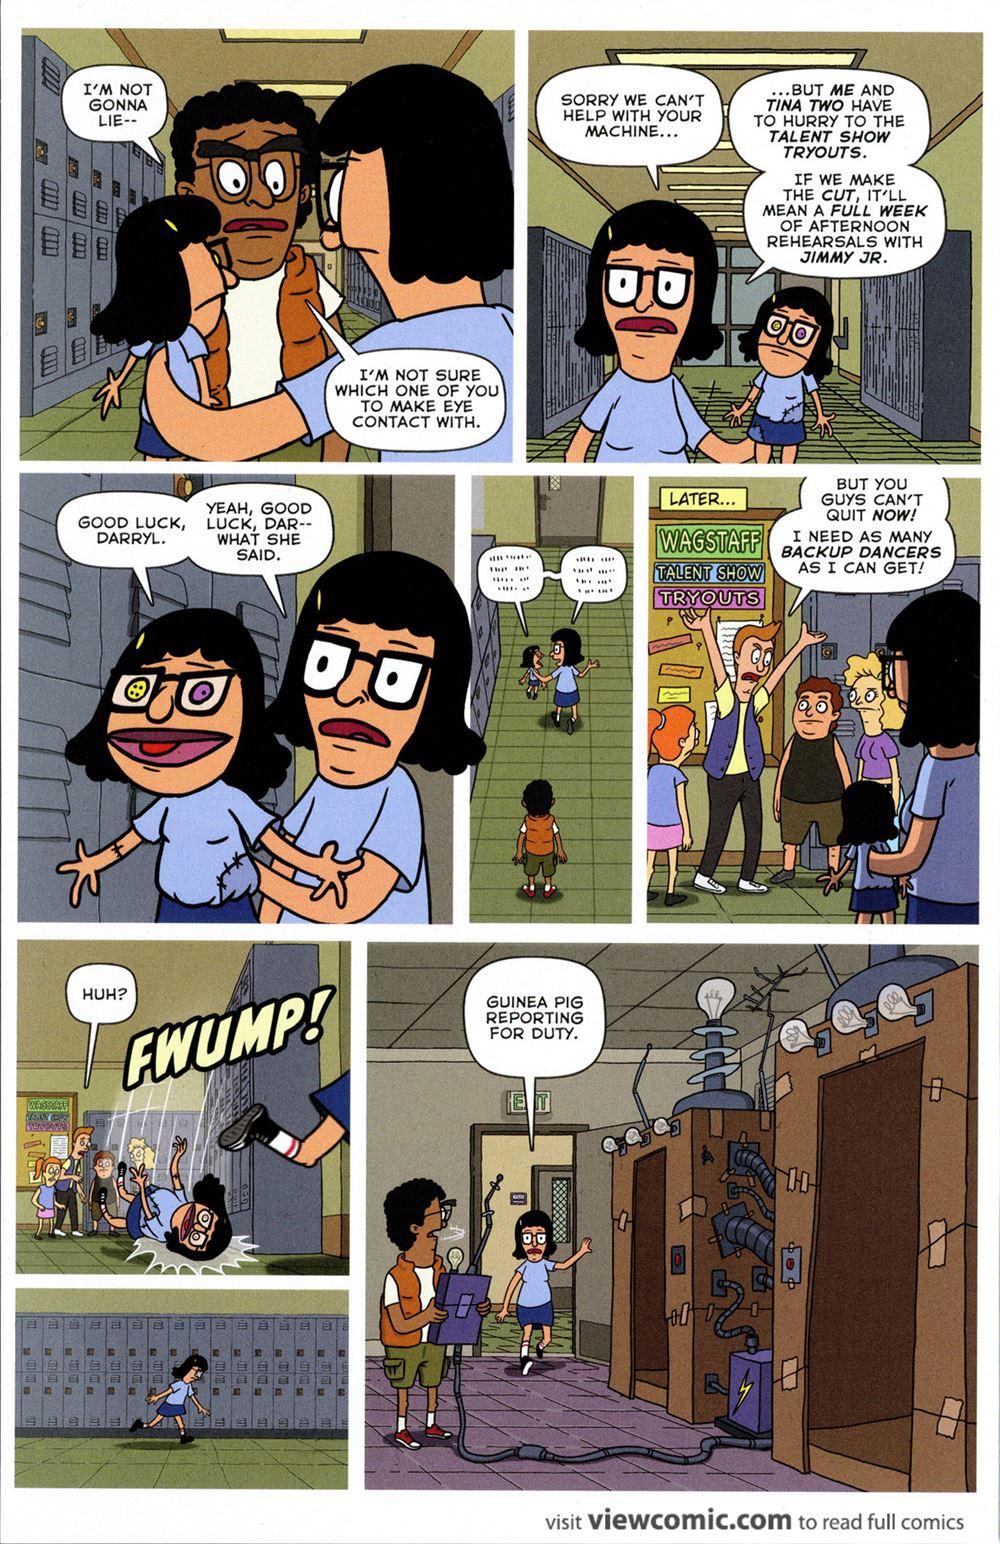 Free Bobs Burgers Porn free comic book day 2016 – bob's burgers … | viewcomic